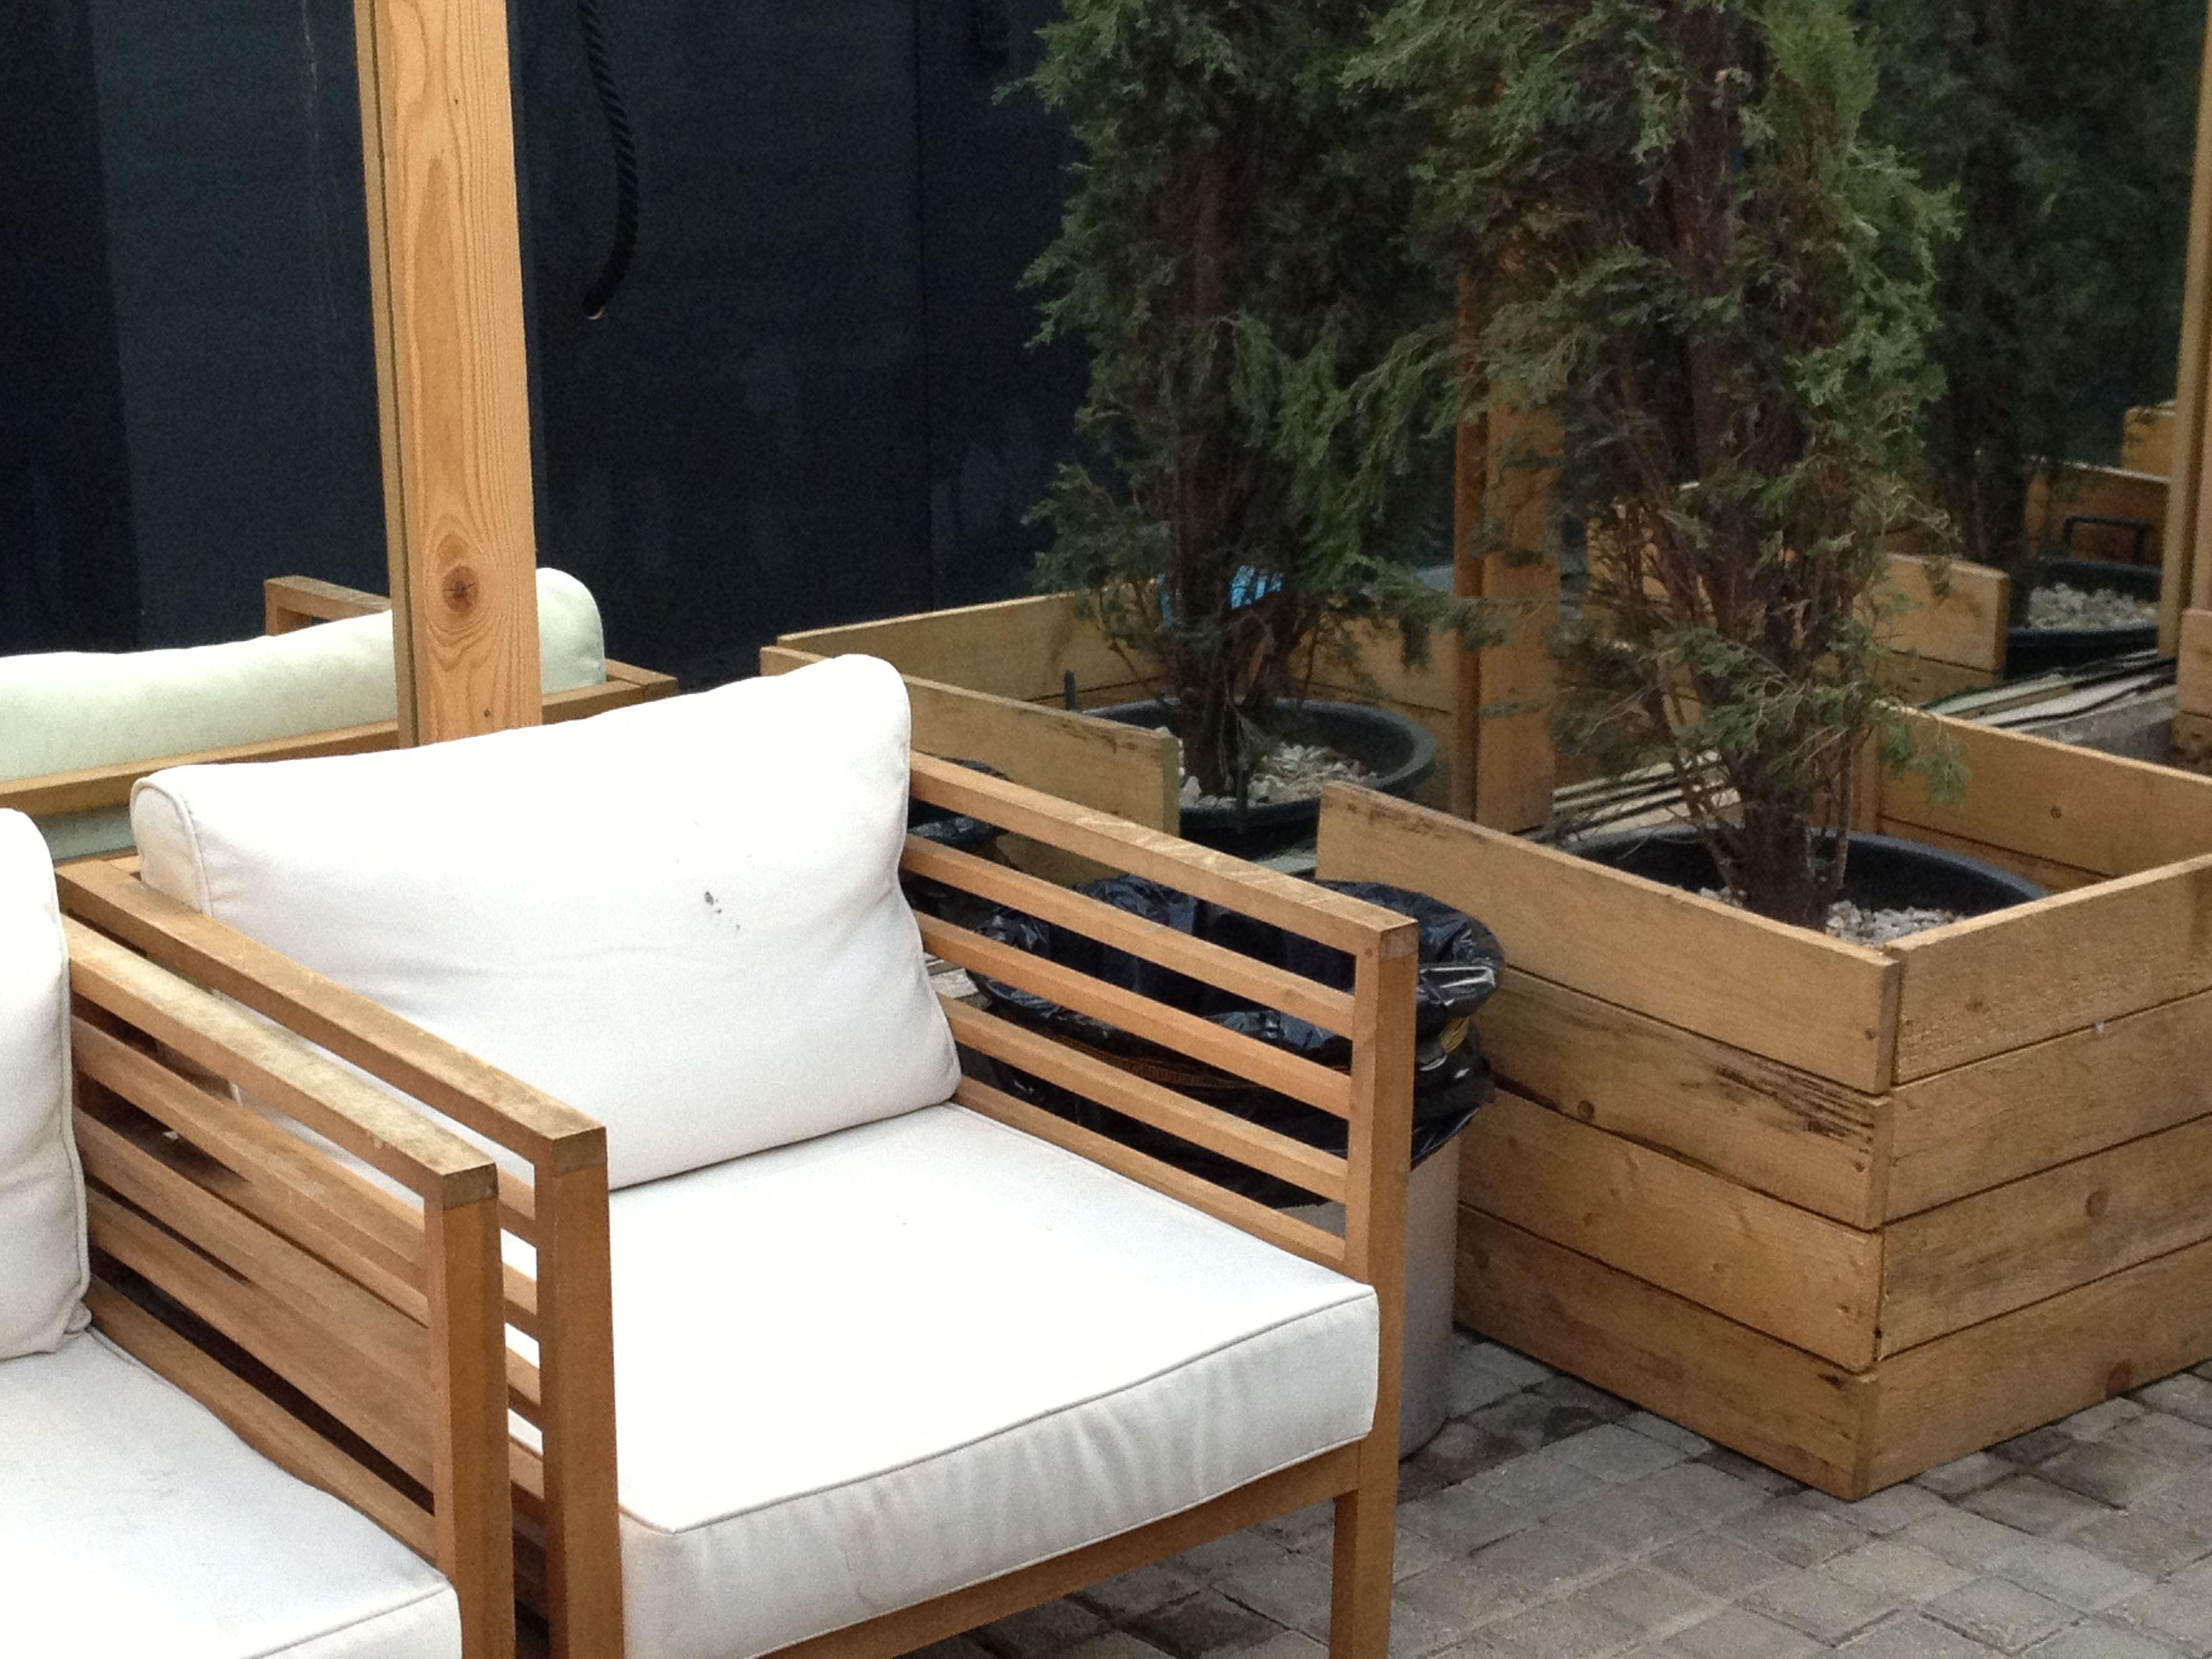 garden state beirut lebanon - Garden Furniture Lebanon